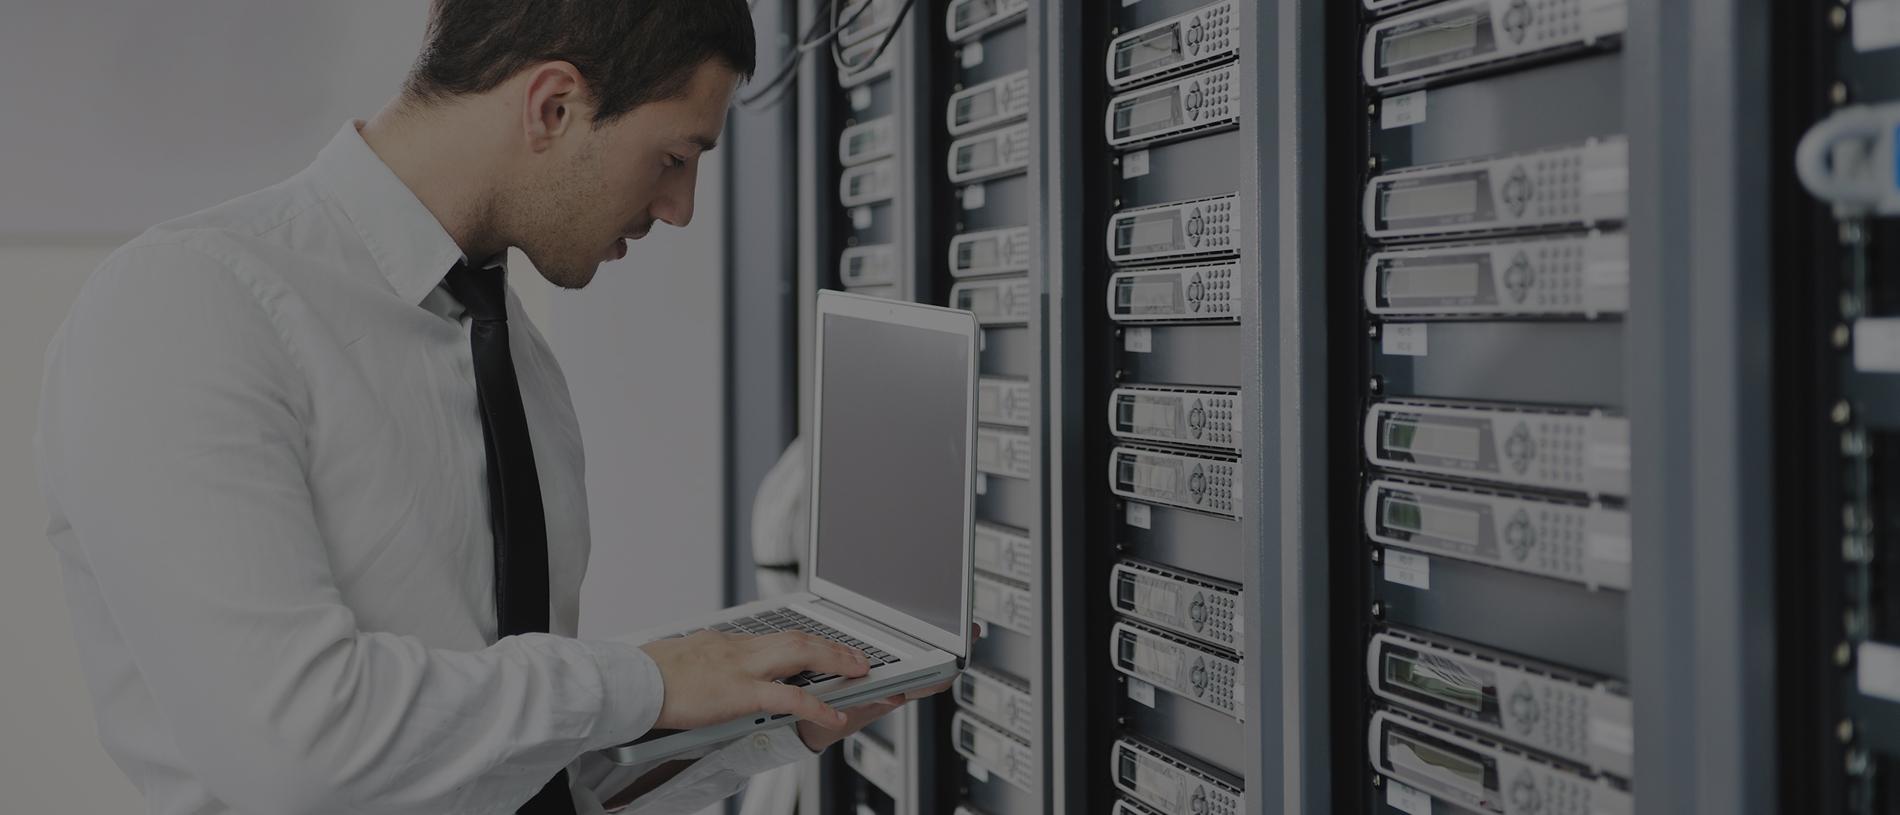 Iptelekom - Telekomunikacja dla biznesu